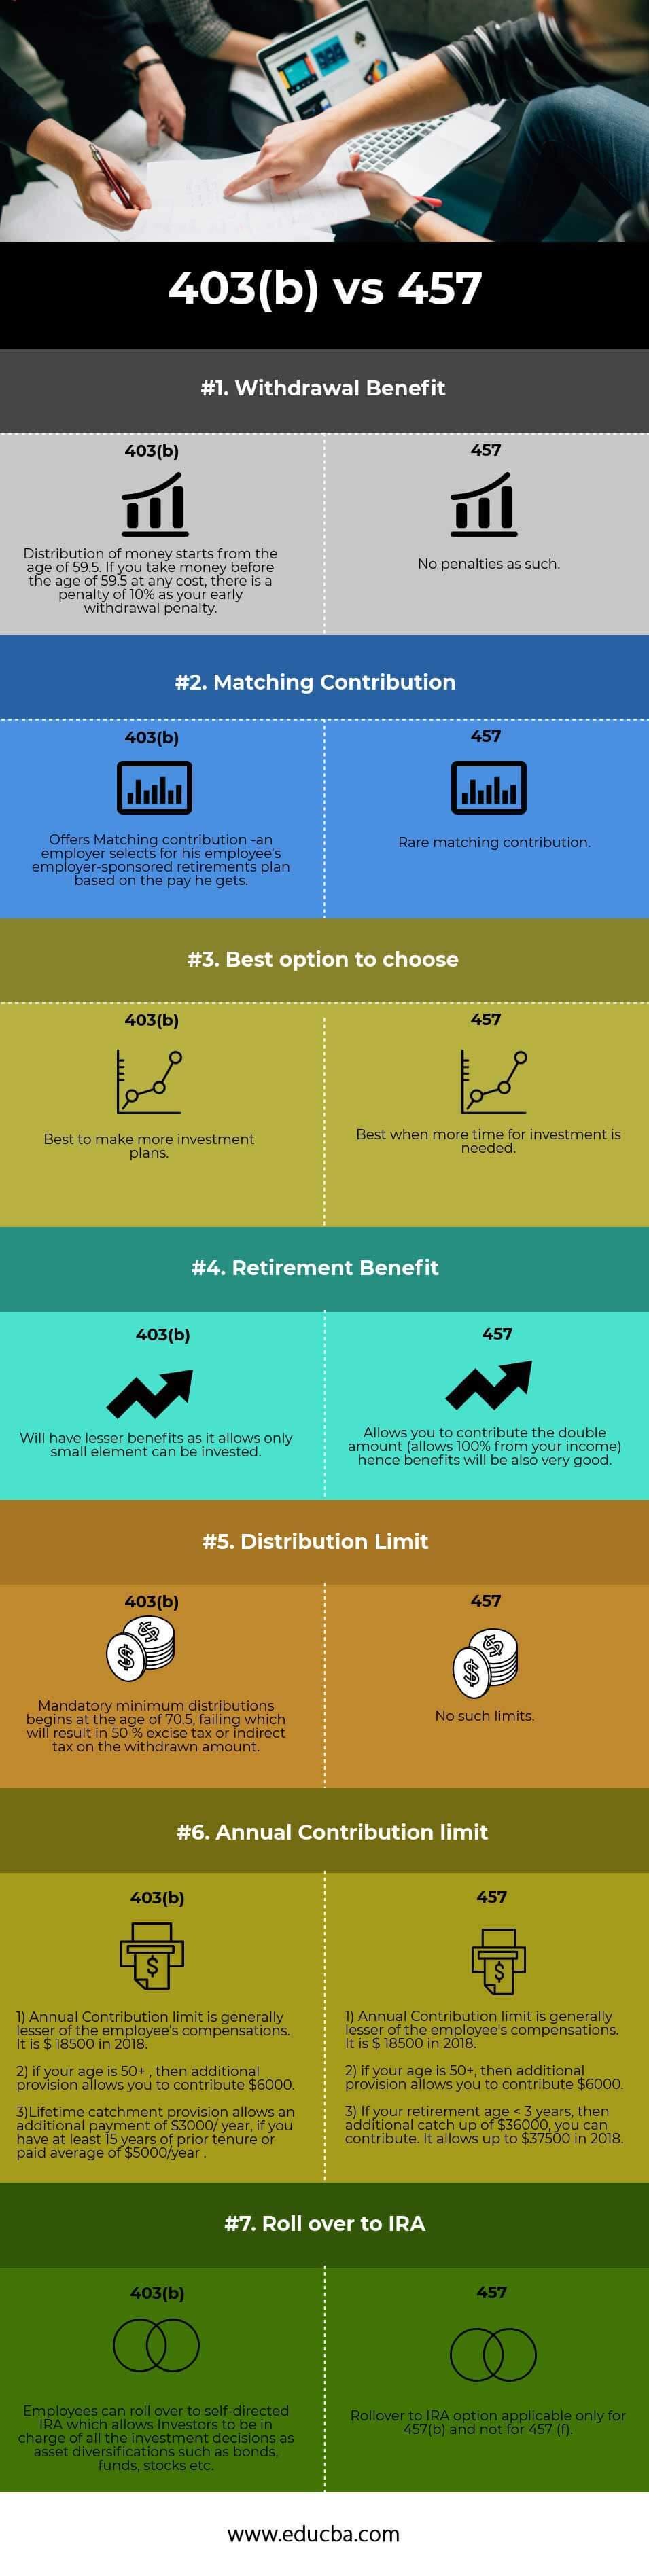 403(b) vs 457 infographics